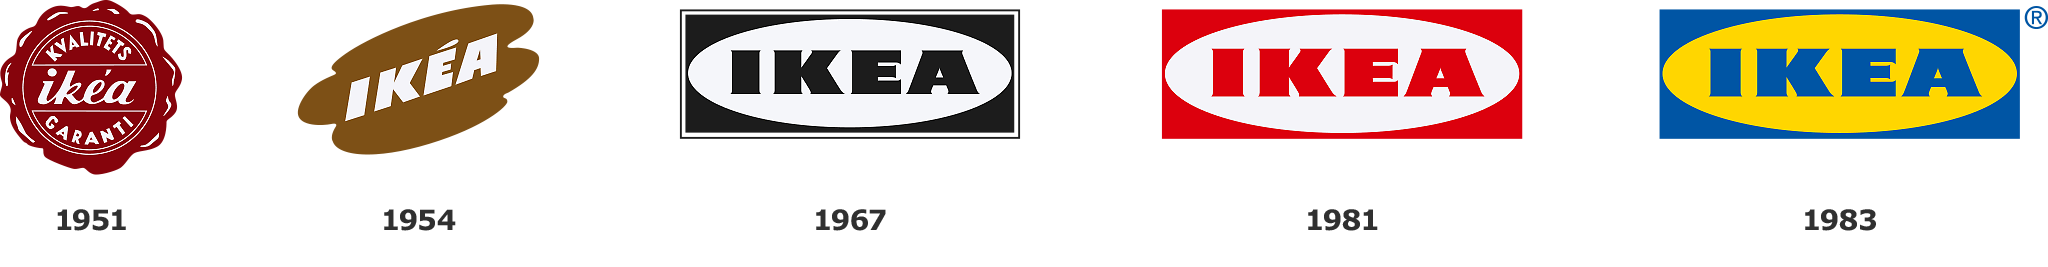 Restyling logo Ikea